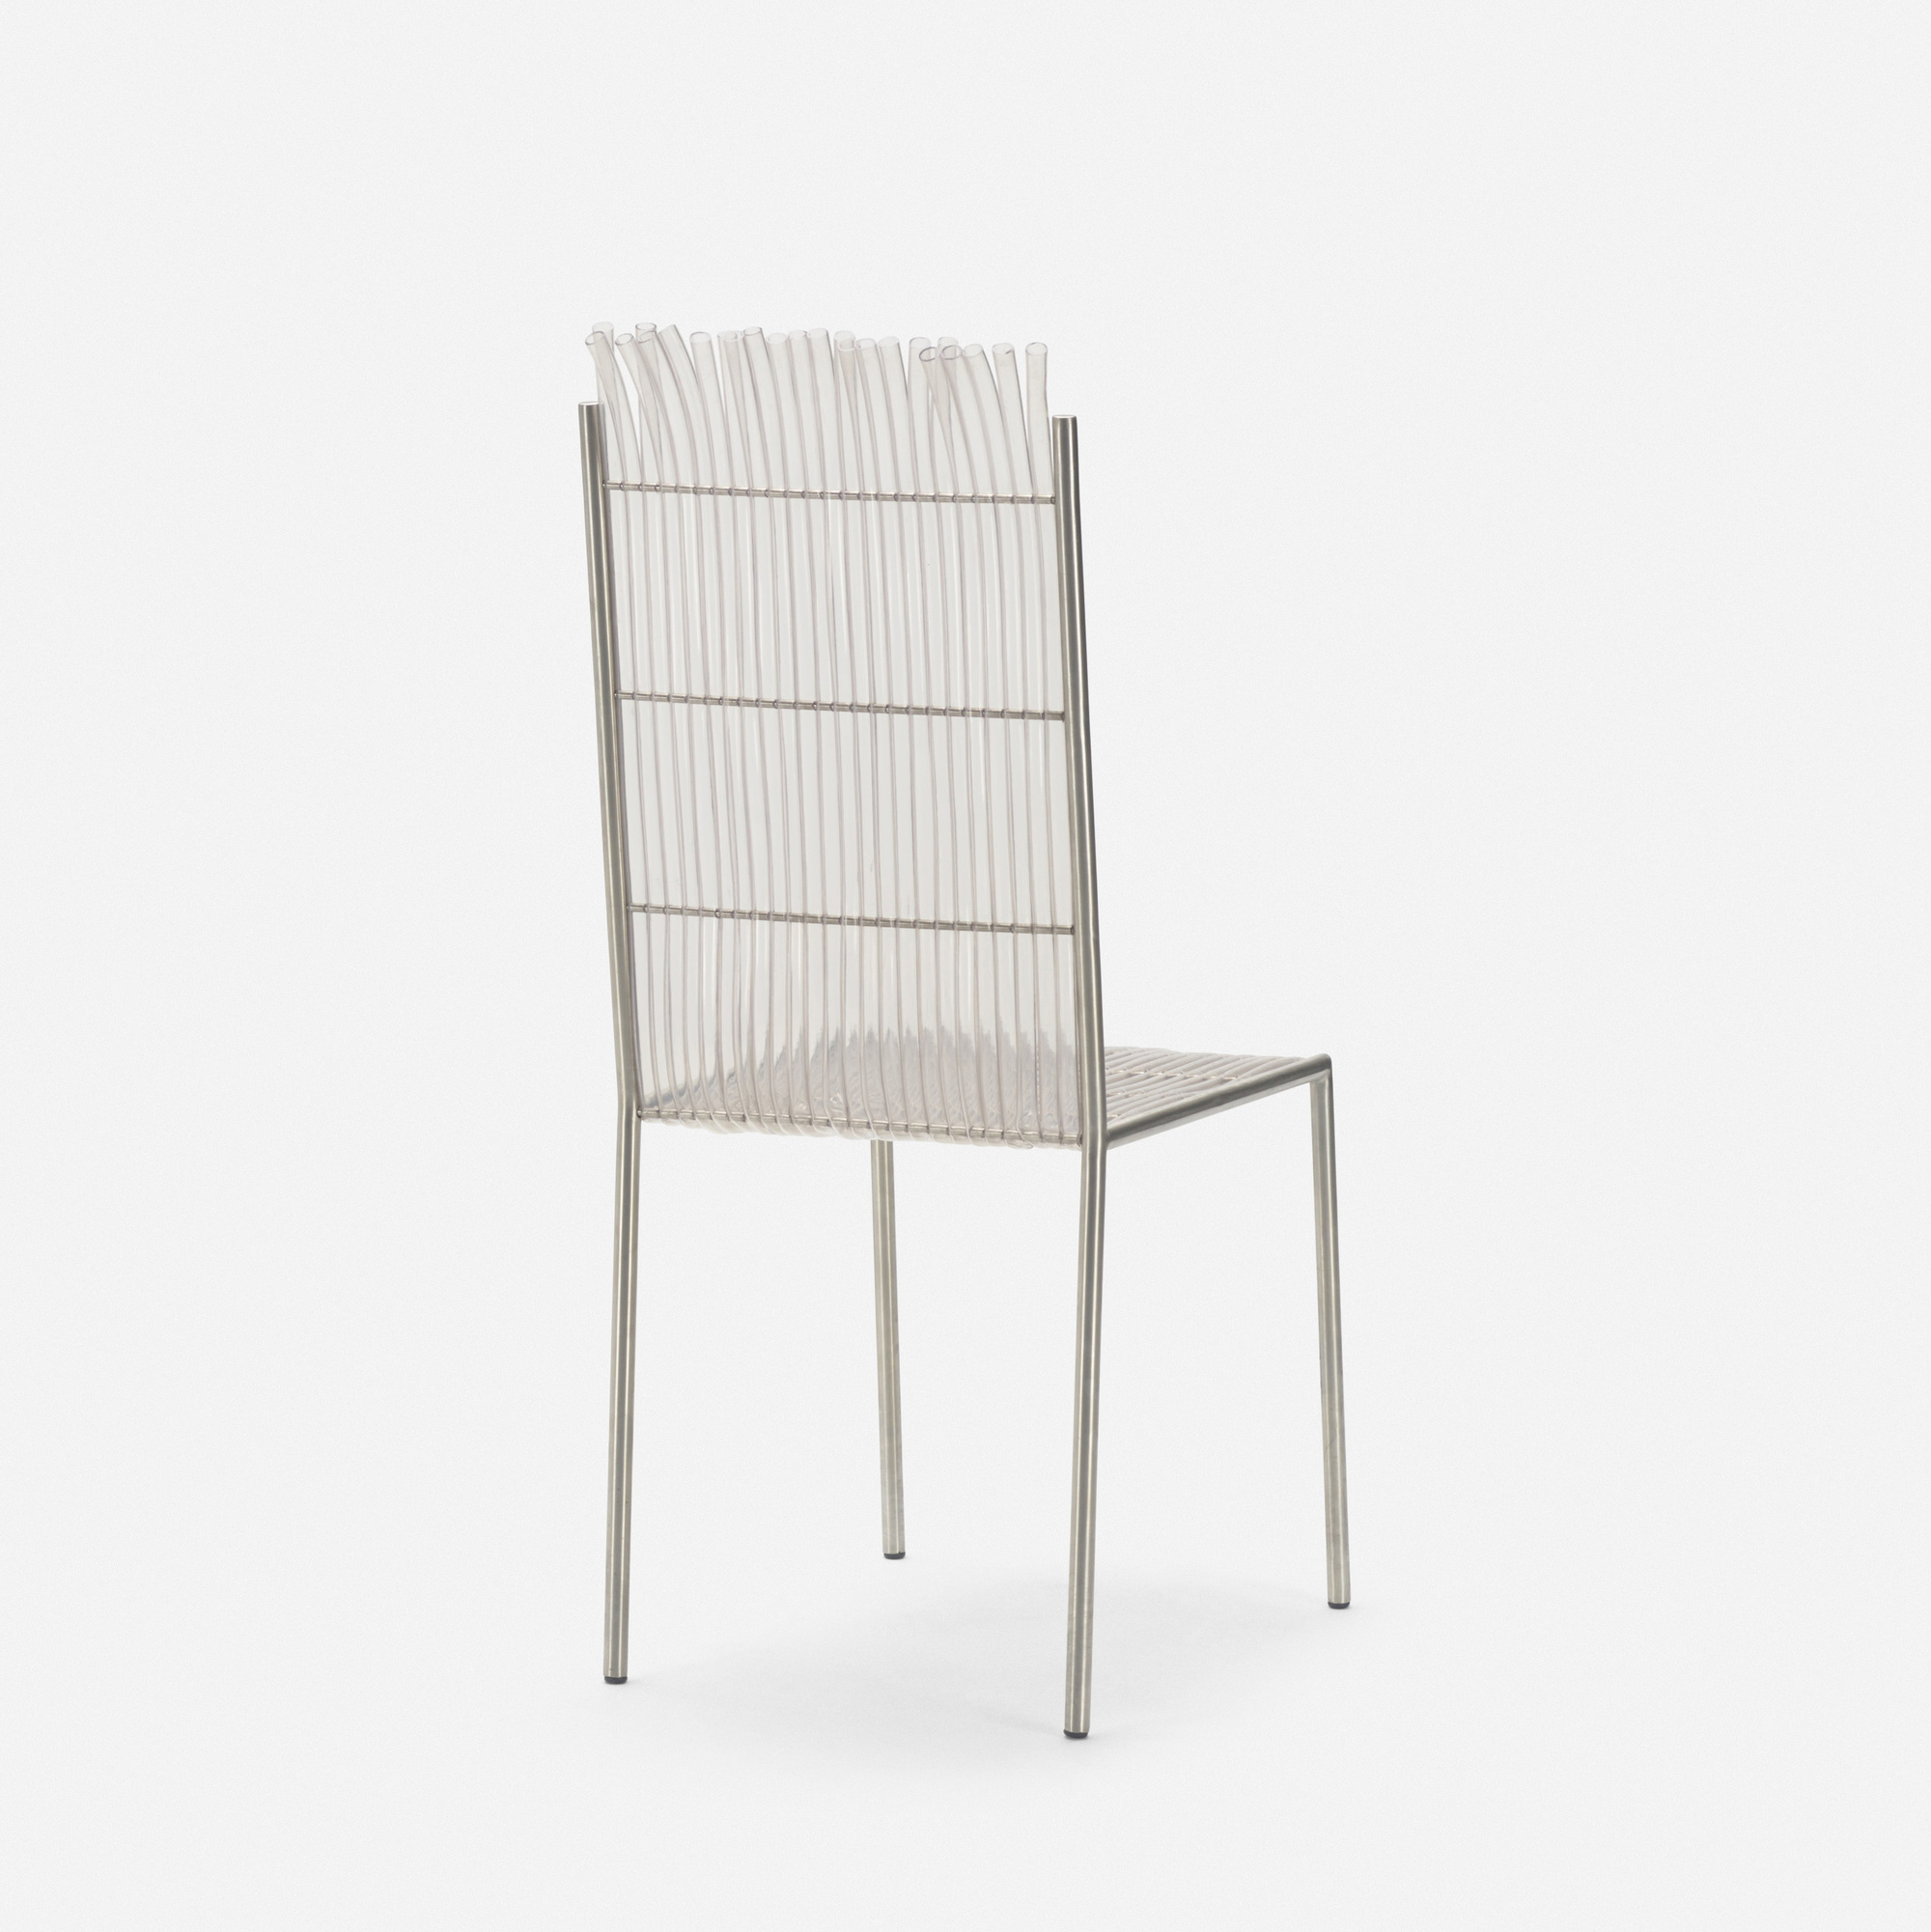 403: Fernando and Humberto Campana / Jardim chair (2 of 4)